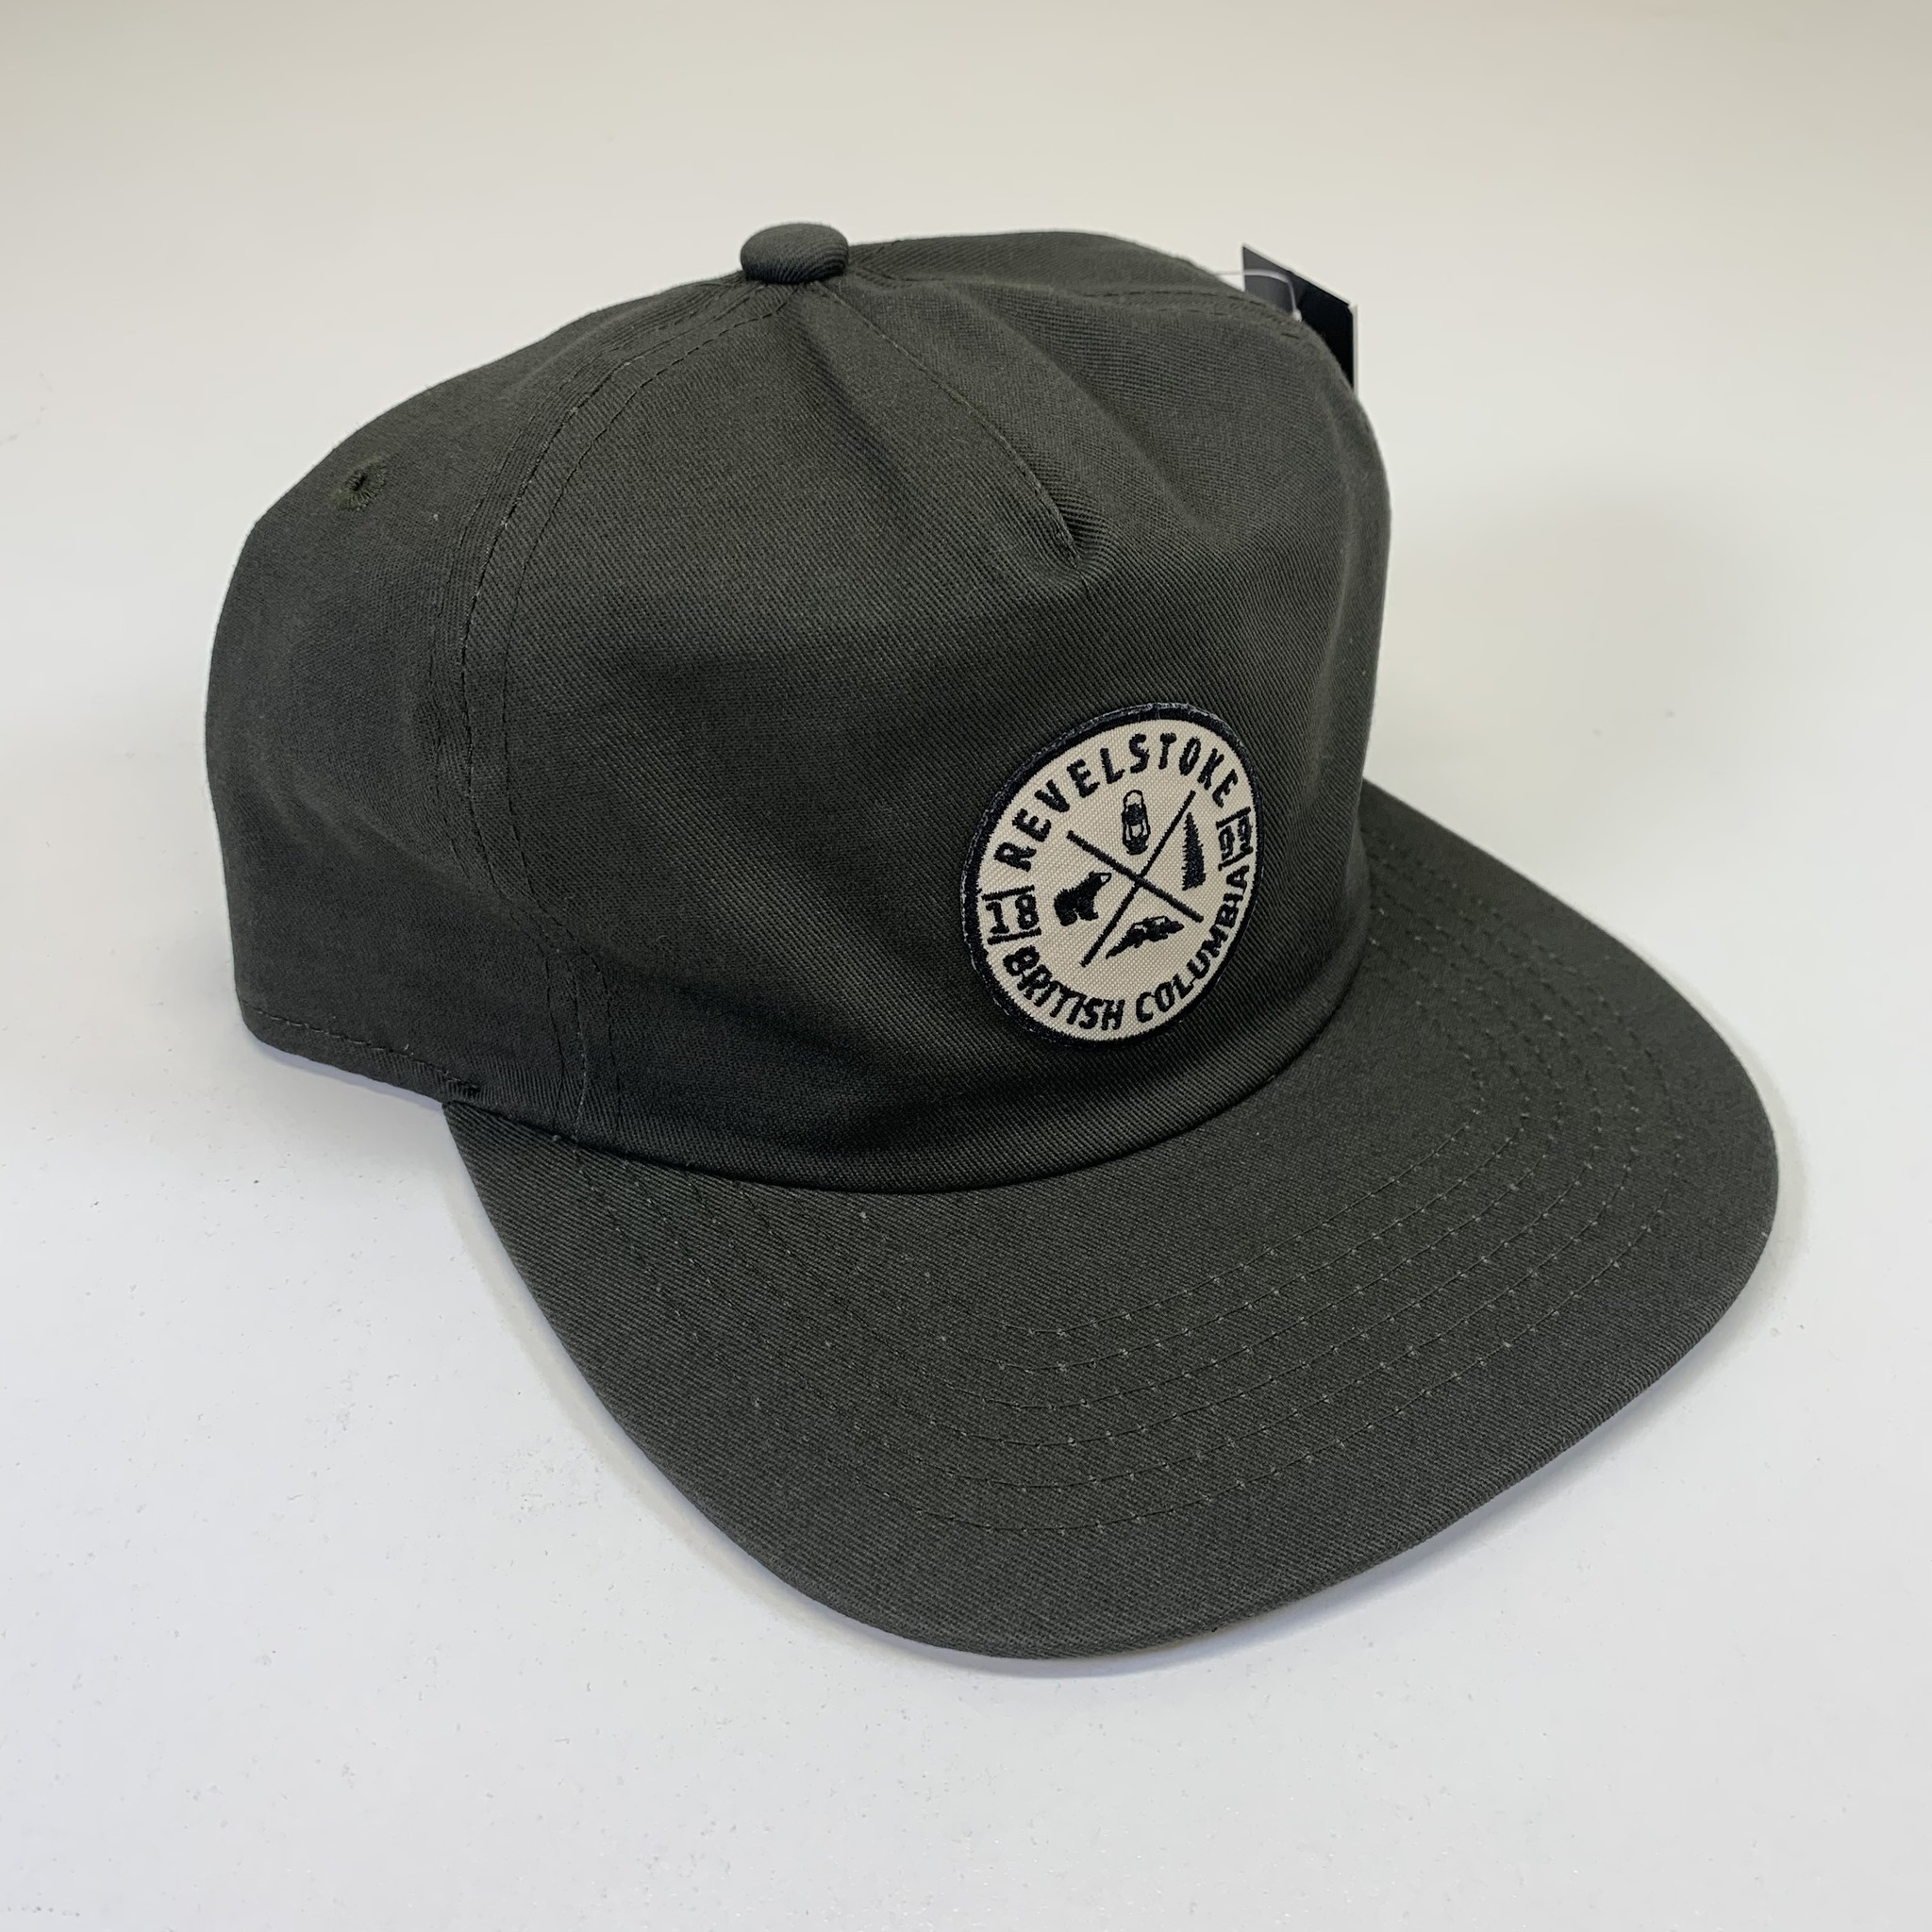 Trading Co. Revelstoke - 1899 Patch Cap (Olive)